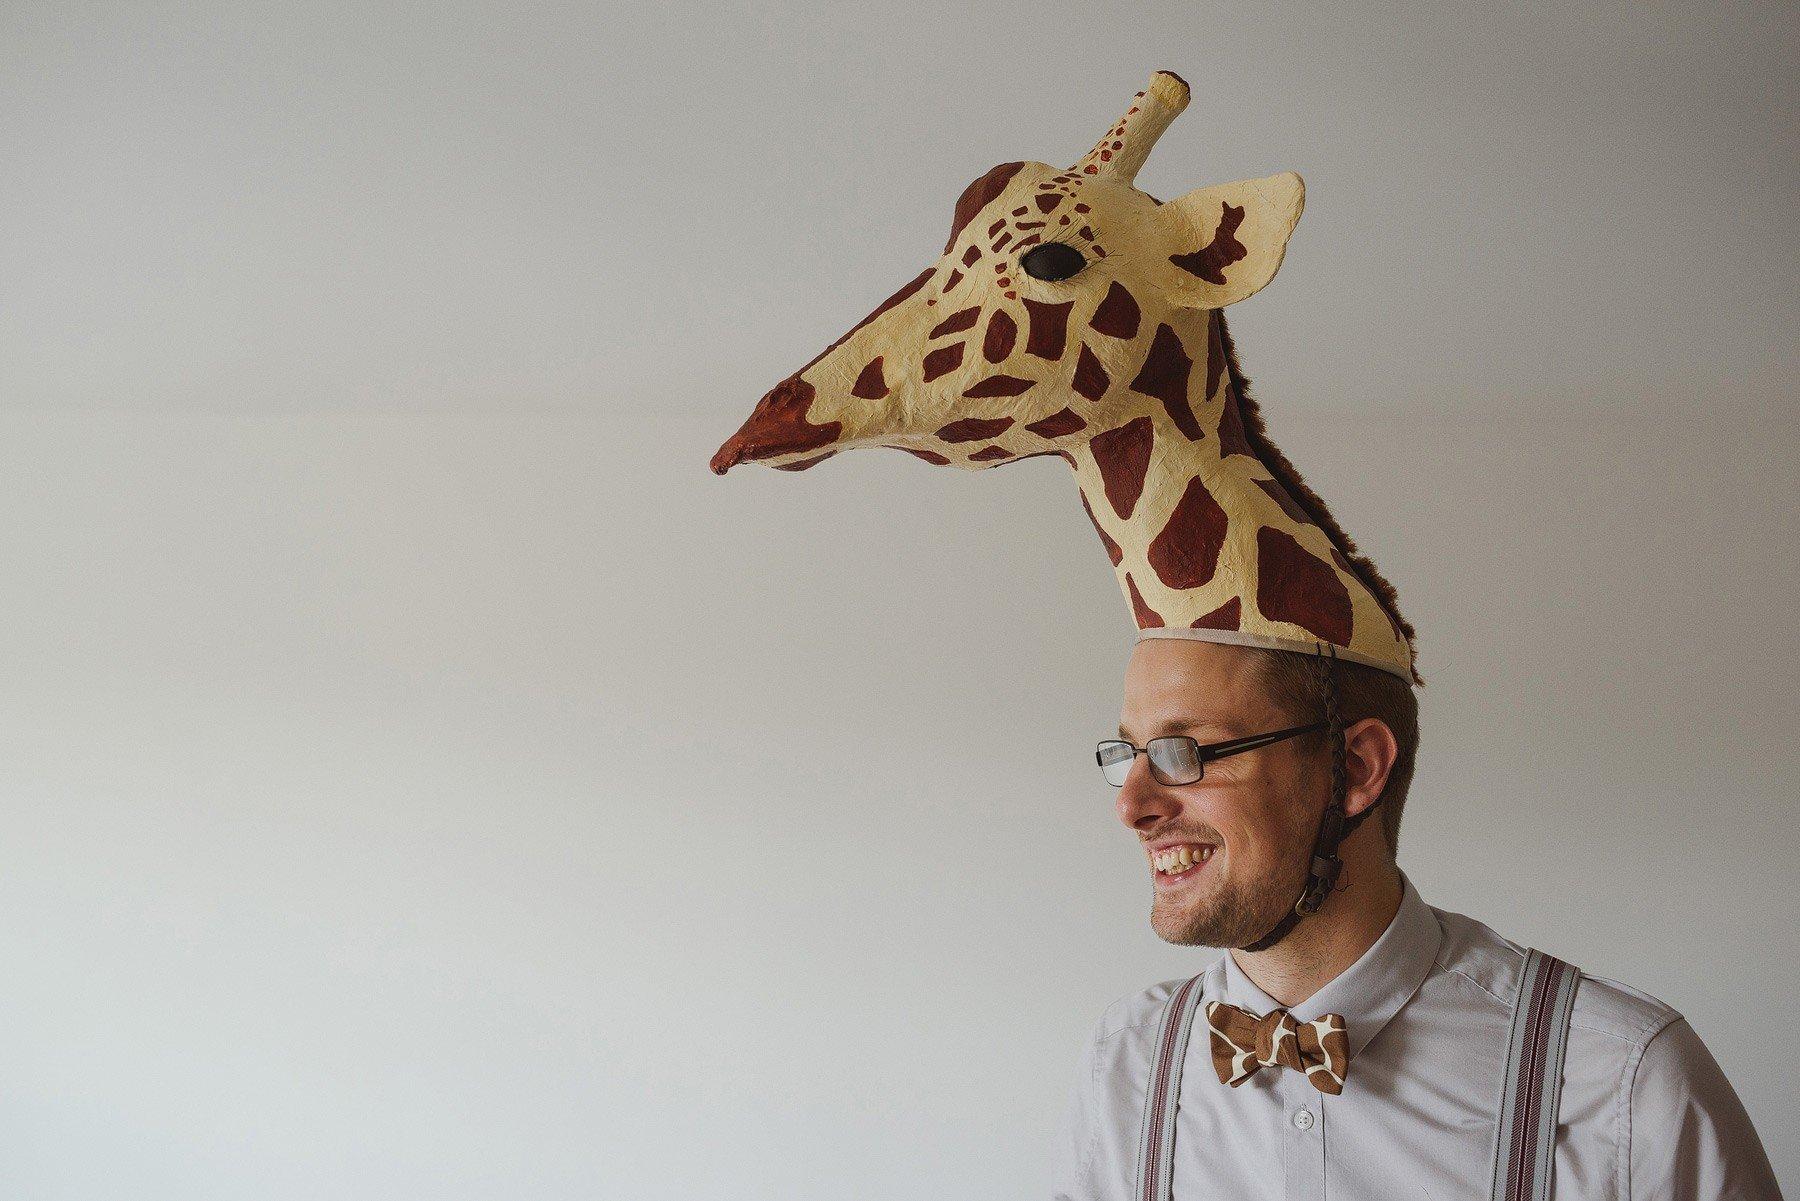 groom dressed as a giraffe